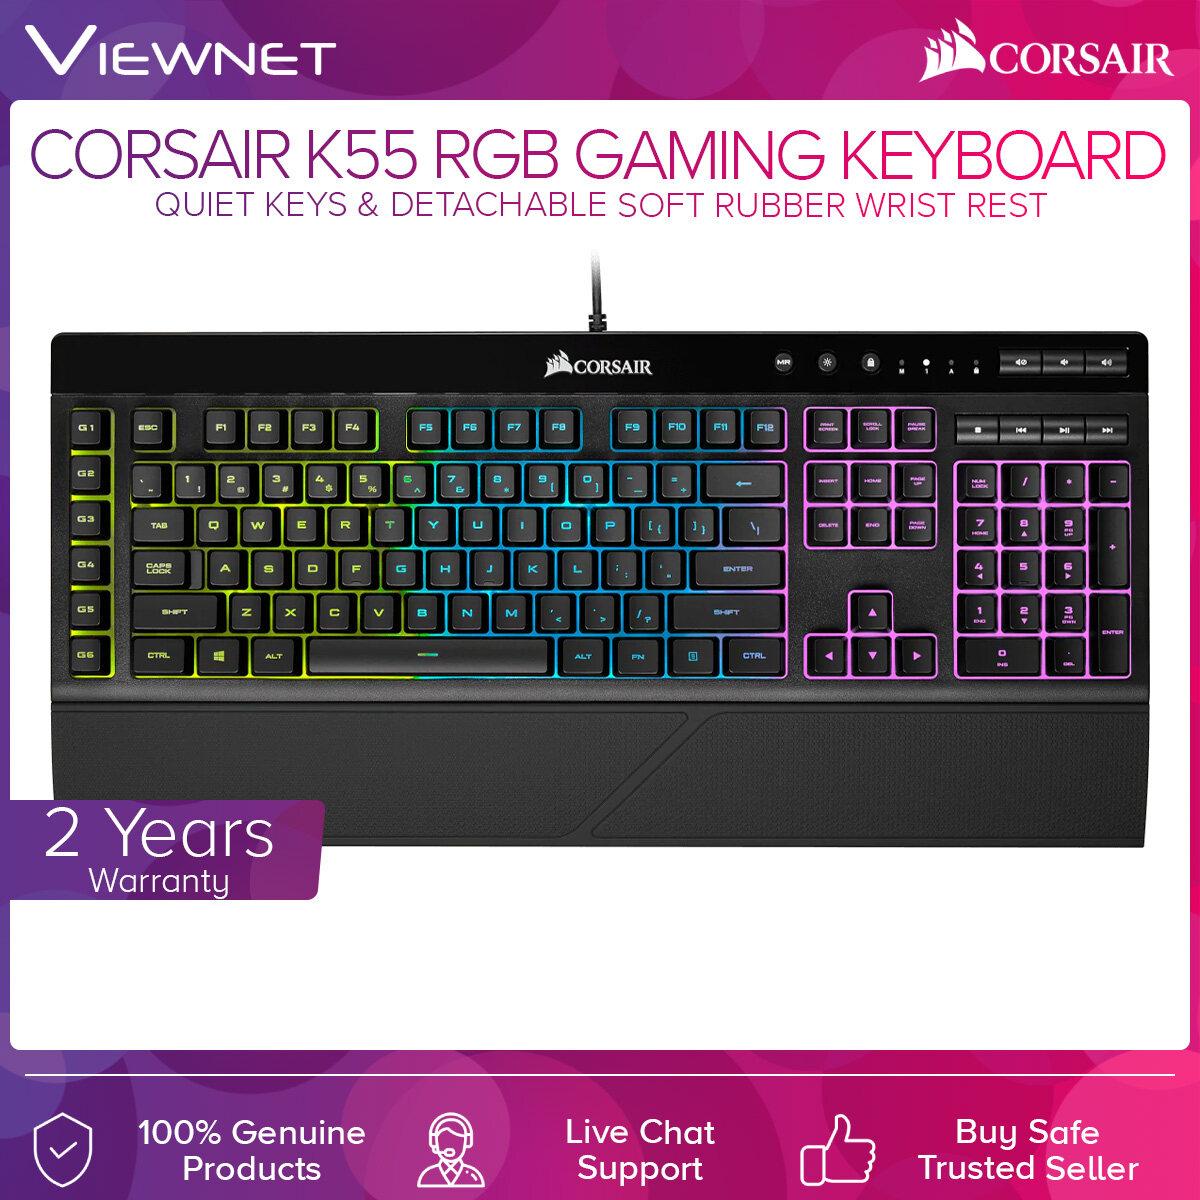 Corsair K55 RGB USB 2.0 Gaming Keyboard with Quiet Keys & Detachable Soft Rubber Wrist Rest (CH-9206015-NA) iCUE Software, Intuitive RGB Backlighting Modes, 6 Dedicated Macro Keys, Multi-Key Anti-Ghosting, On-the-Fly Media Controls, Windows Key Lock Mode